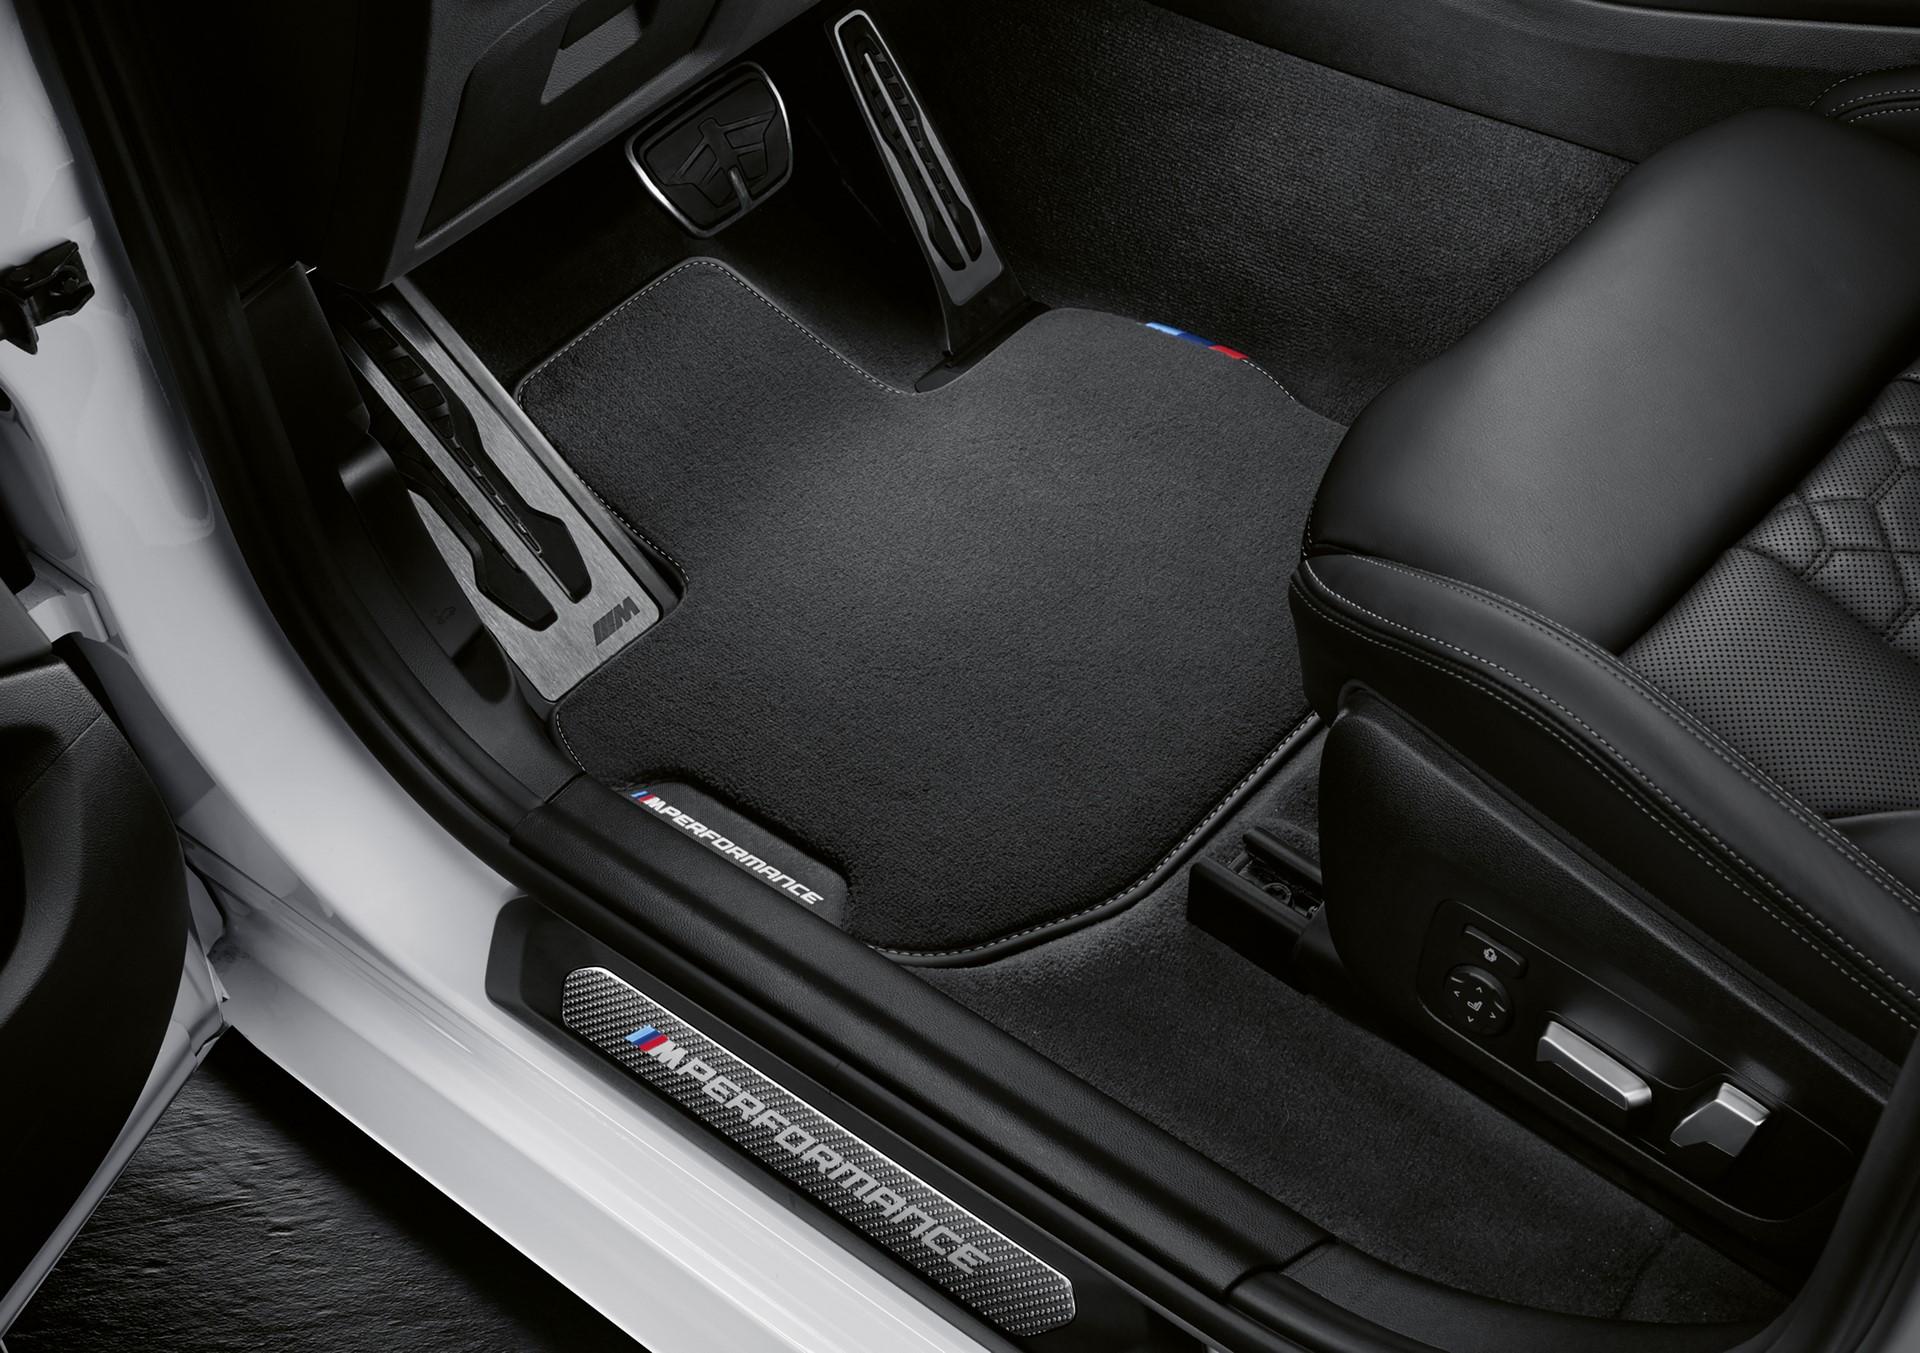 BMW-X3-M-and-BMW-X4-M-M-Performance-Parts-10